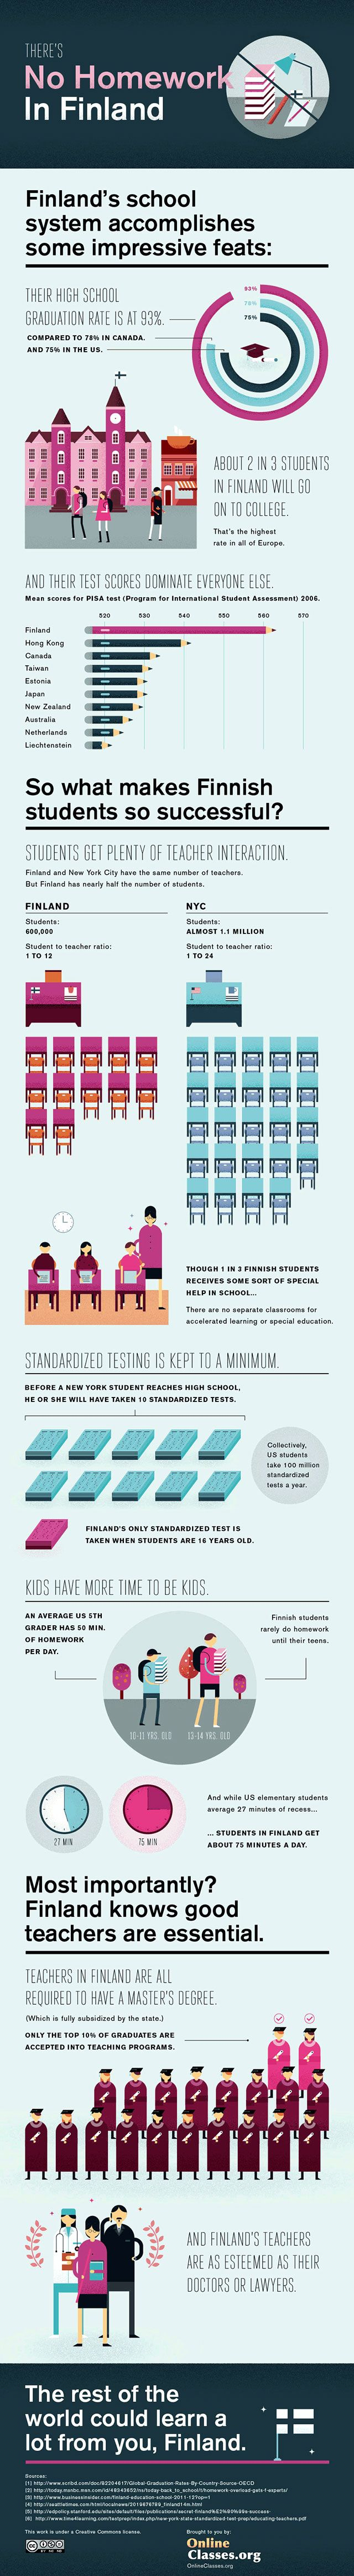 Finland Education